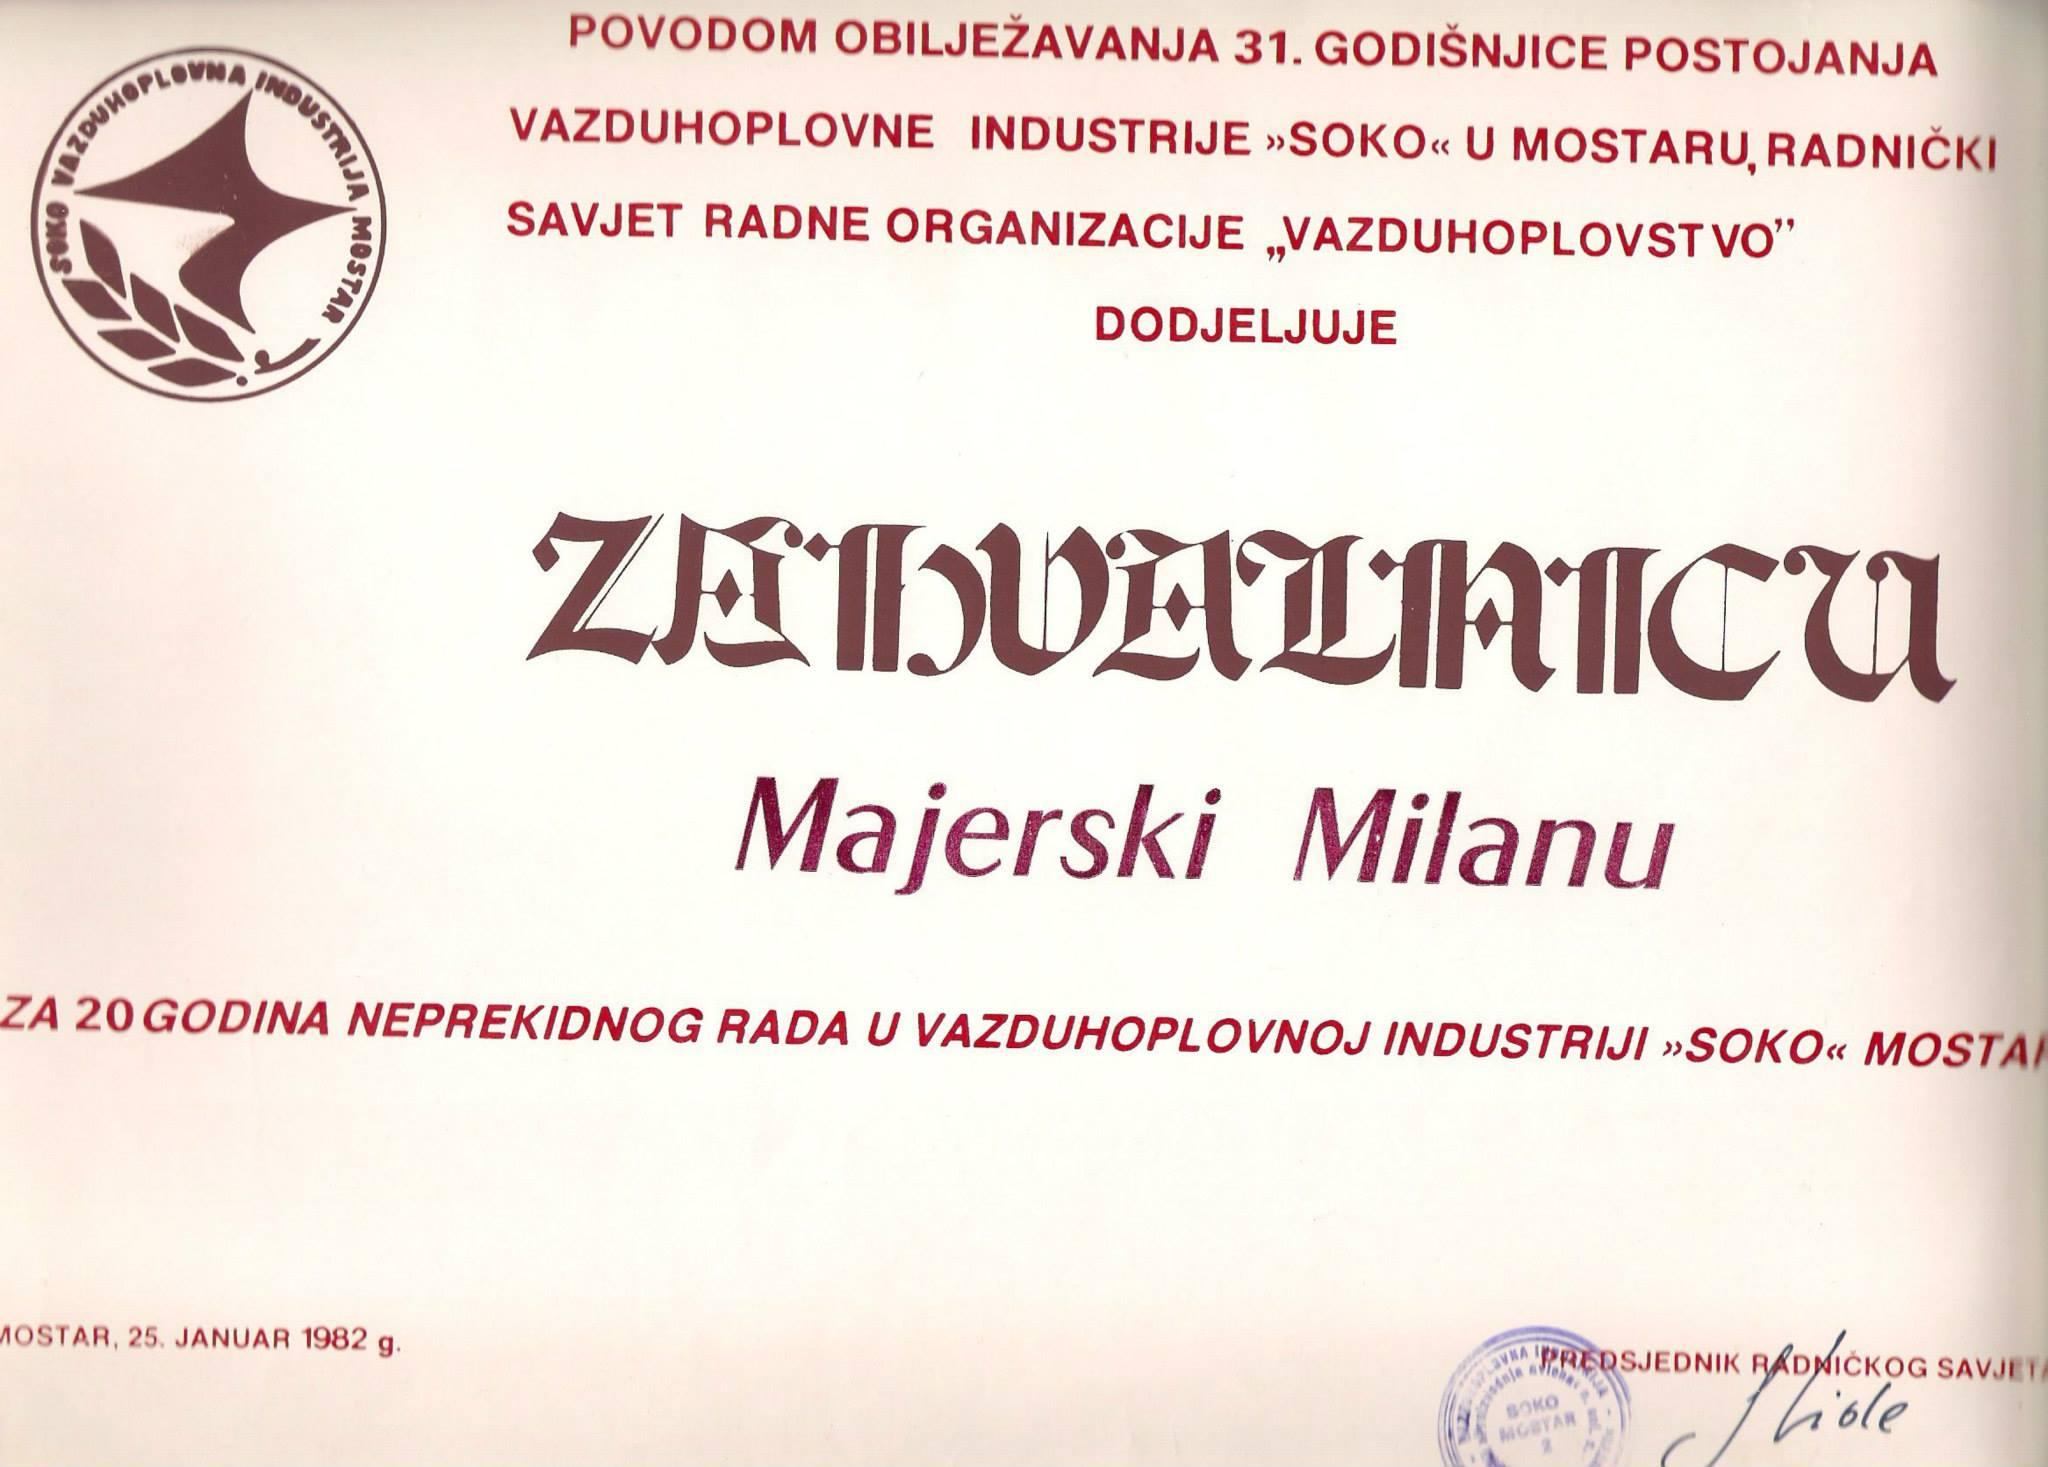 Milan Majersky 00d7b25341c8eb35828644d62f801956b2648c10